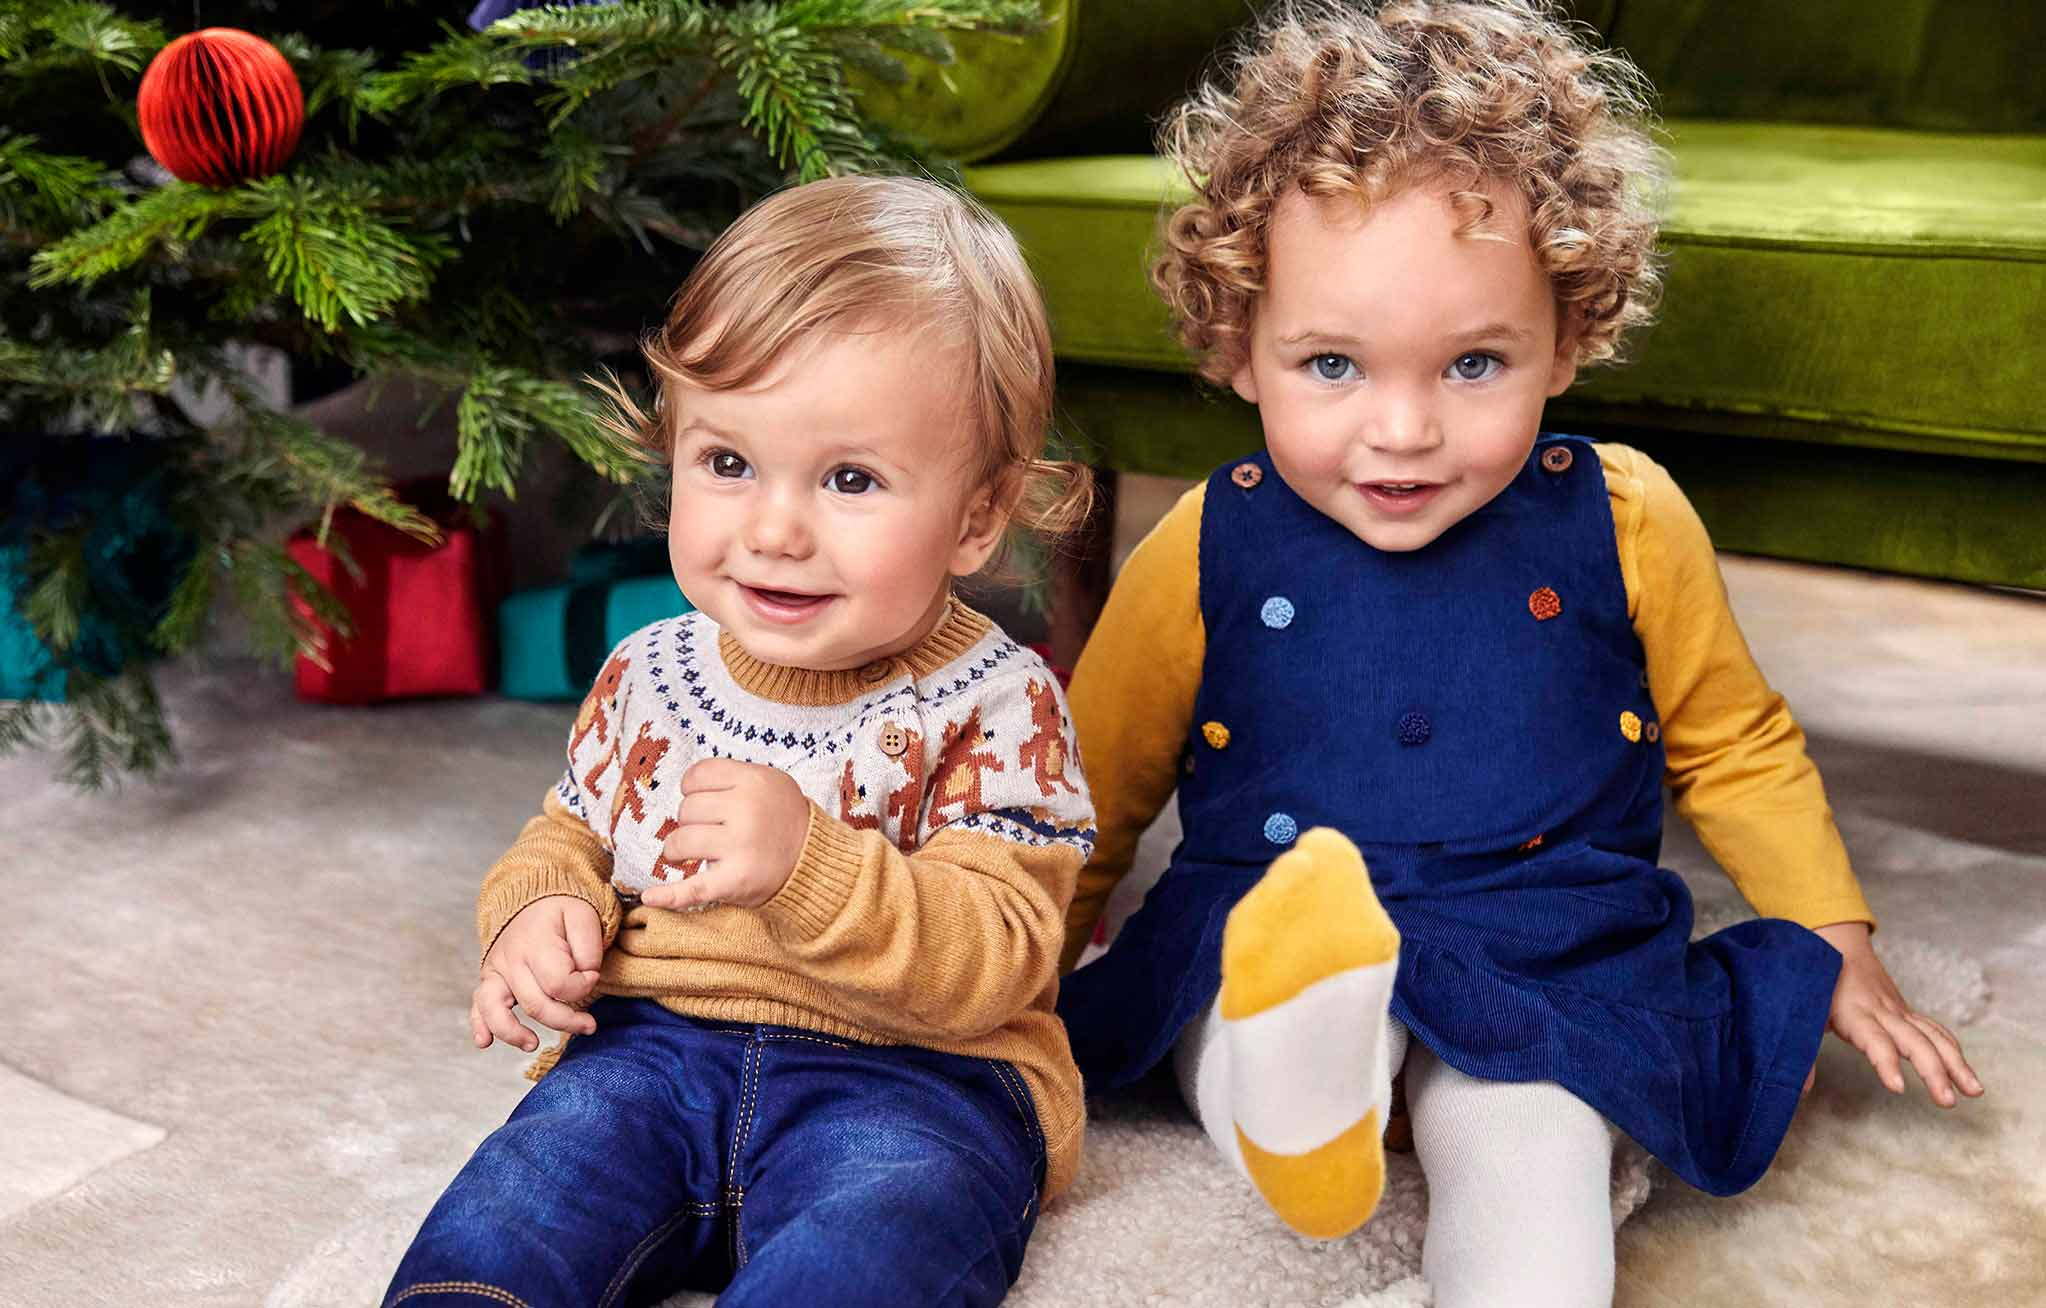 Fun, festive babywear